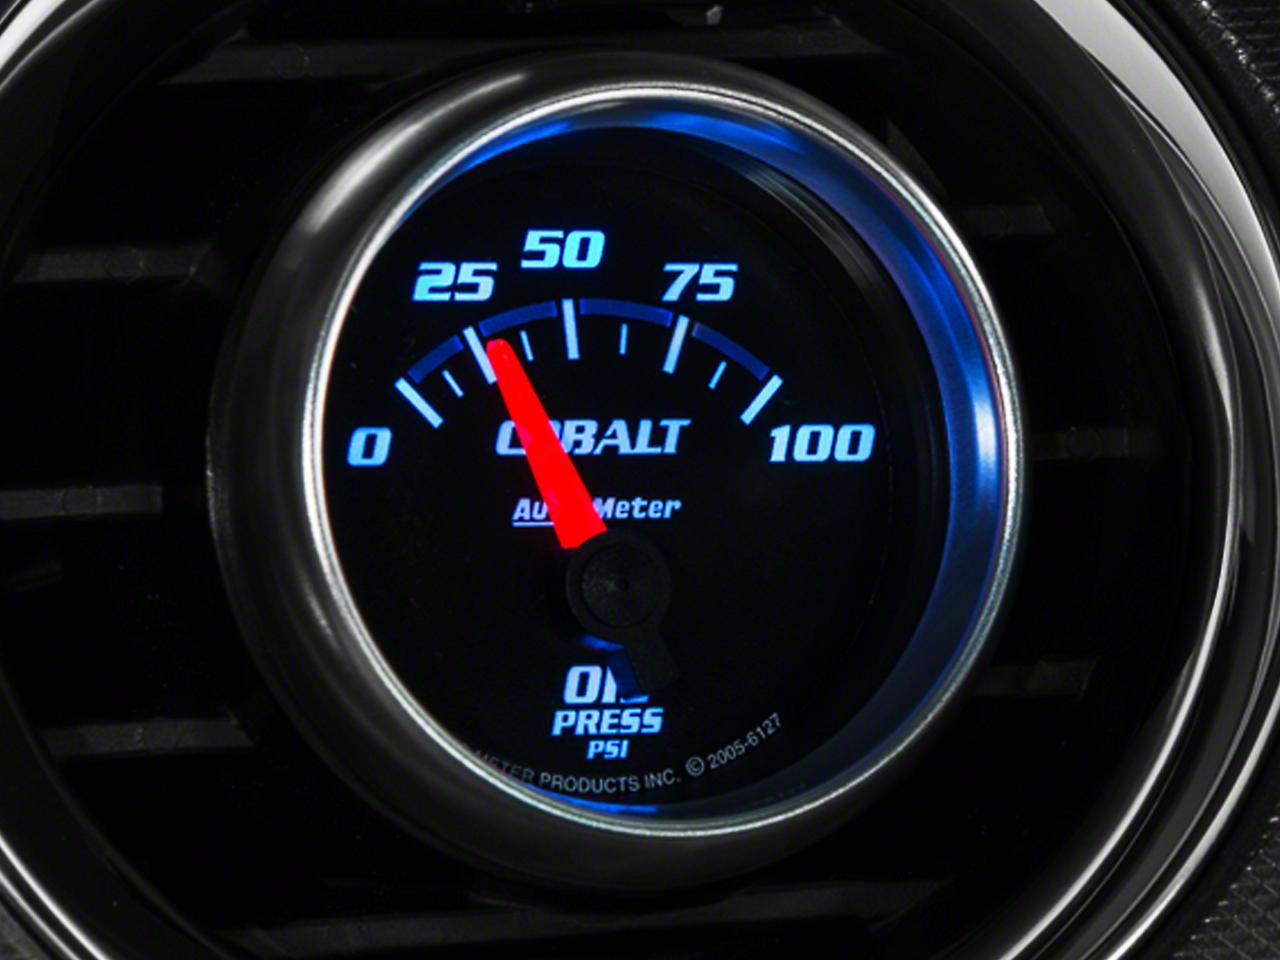 Auto Meter Cobalt Oil Pressure Gauge - Electric (79-17 All)